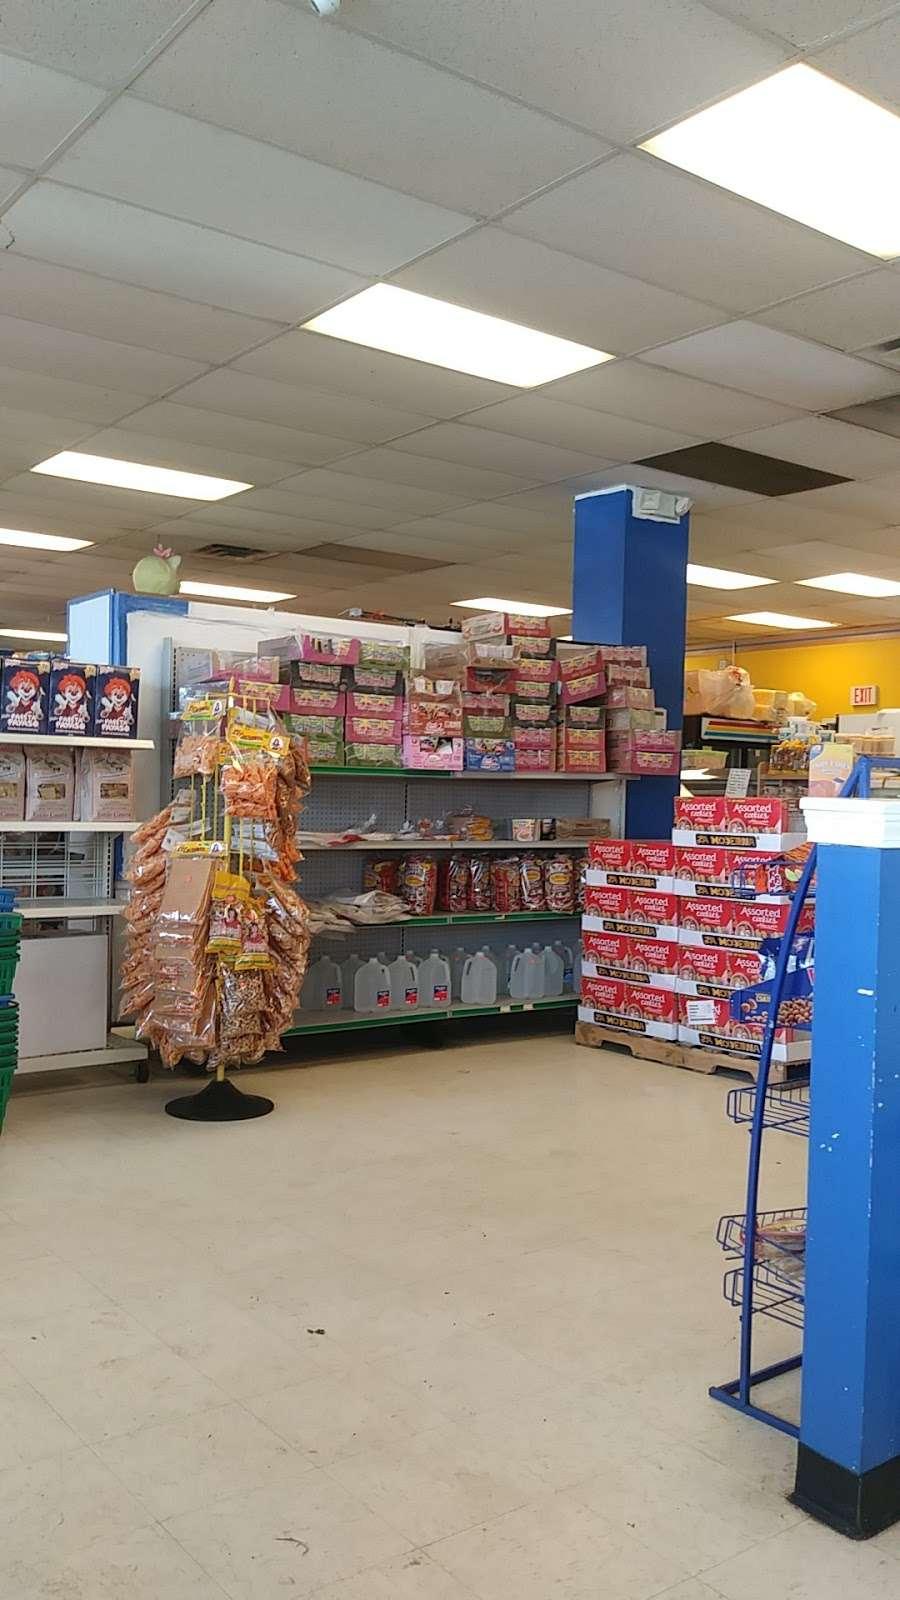 Tienda y Panaderia Guatemalteca - store    Photo 1 of 10   Address: 3709 E Washington St, Indianapolis, IN 46201, USA   Phone: (317) 353-6377